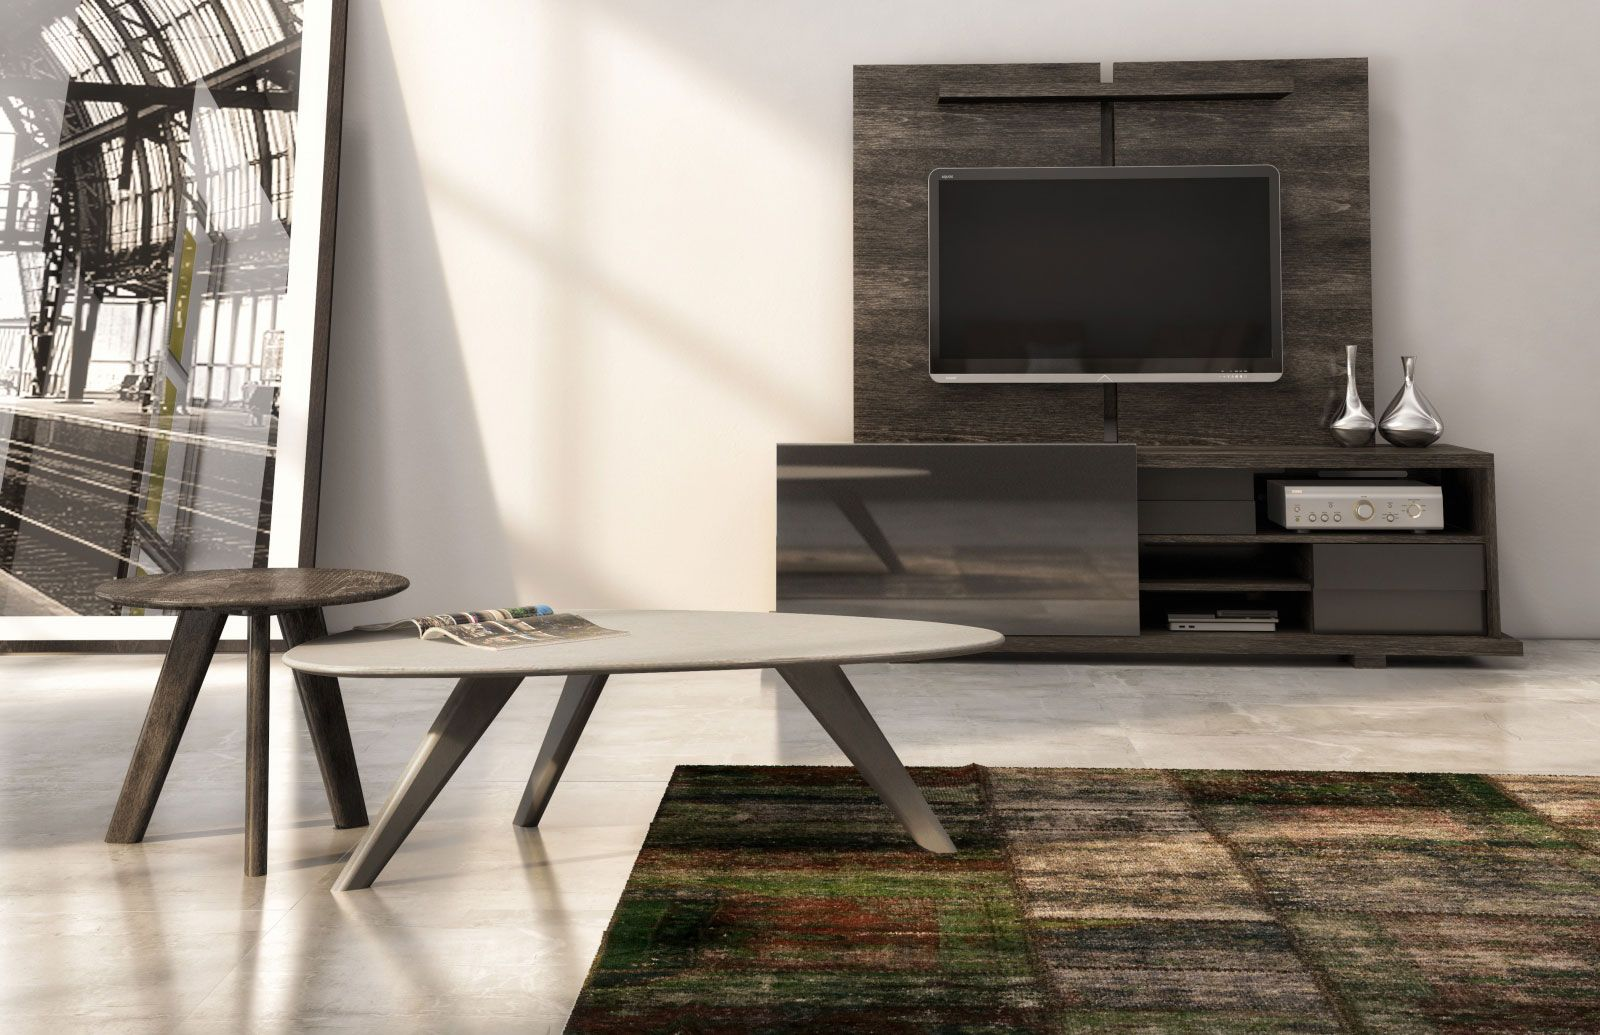 Huppé living 8931 collection furniture manufacturer contemporary huppe net